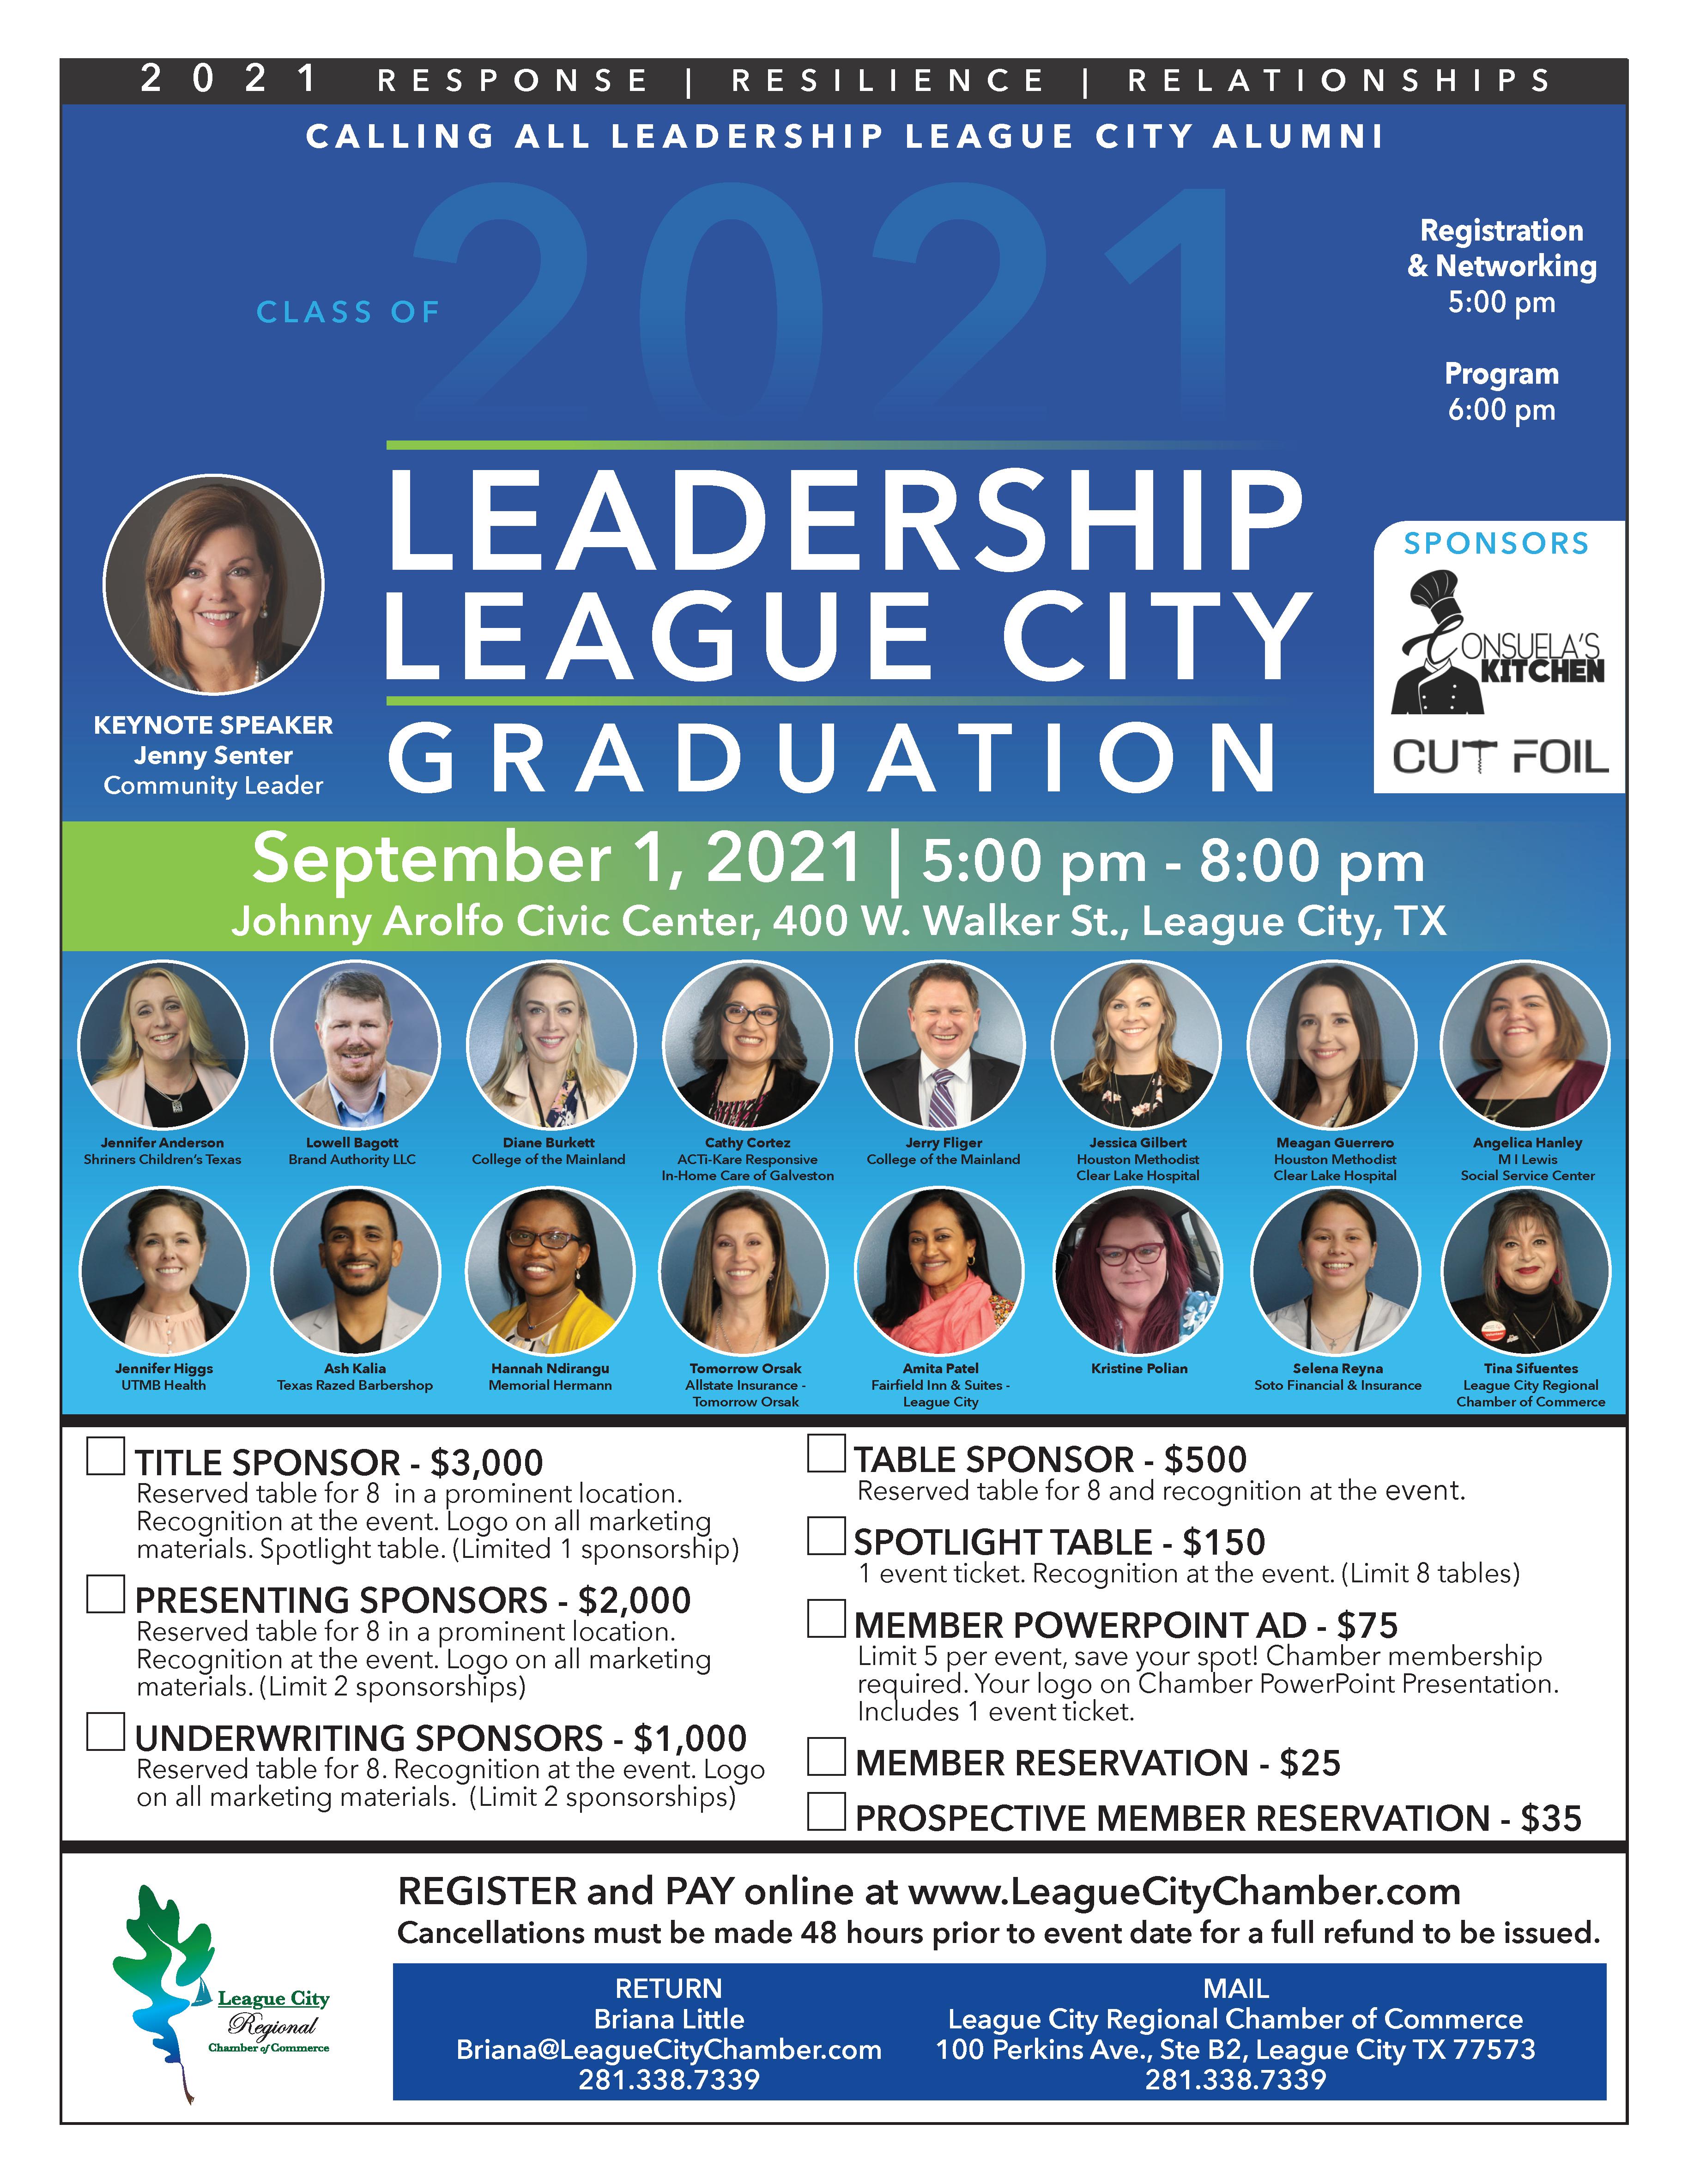 PRESS RELEASE: Attend the Leadership League City Graduation!